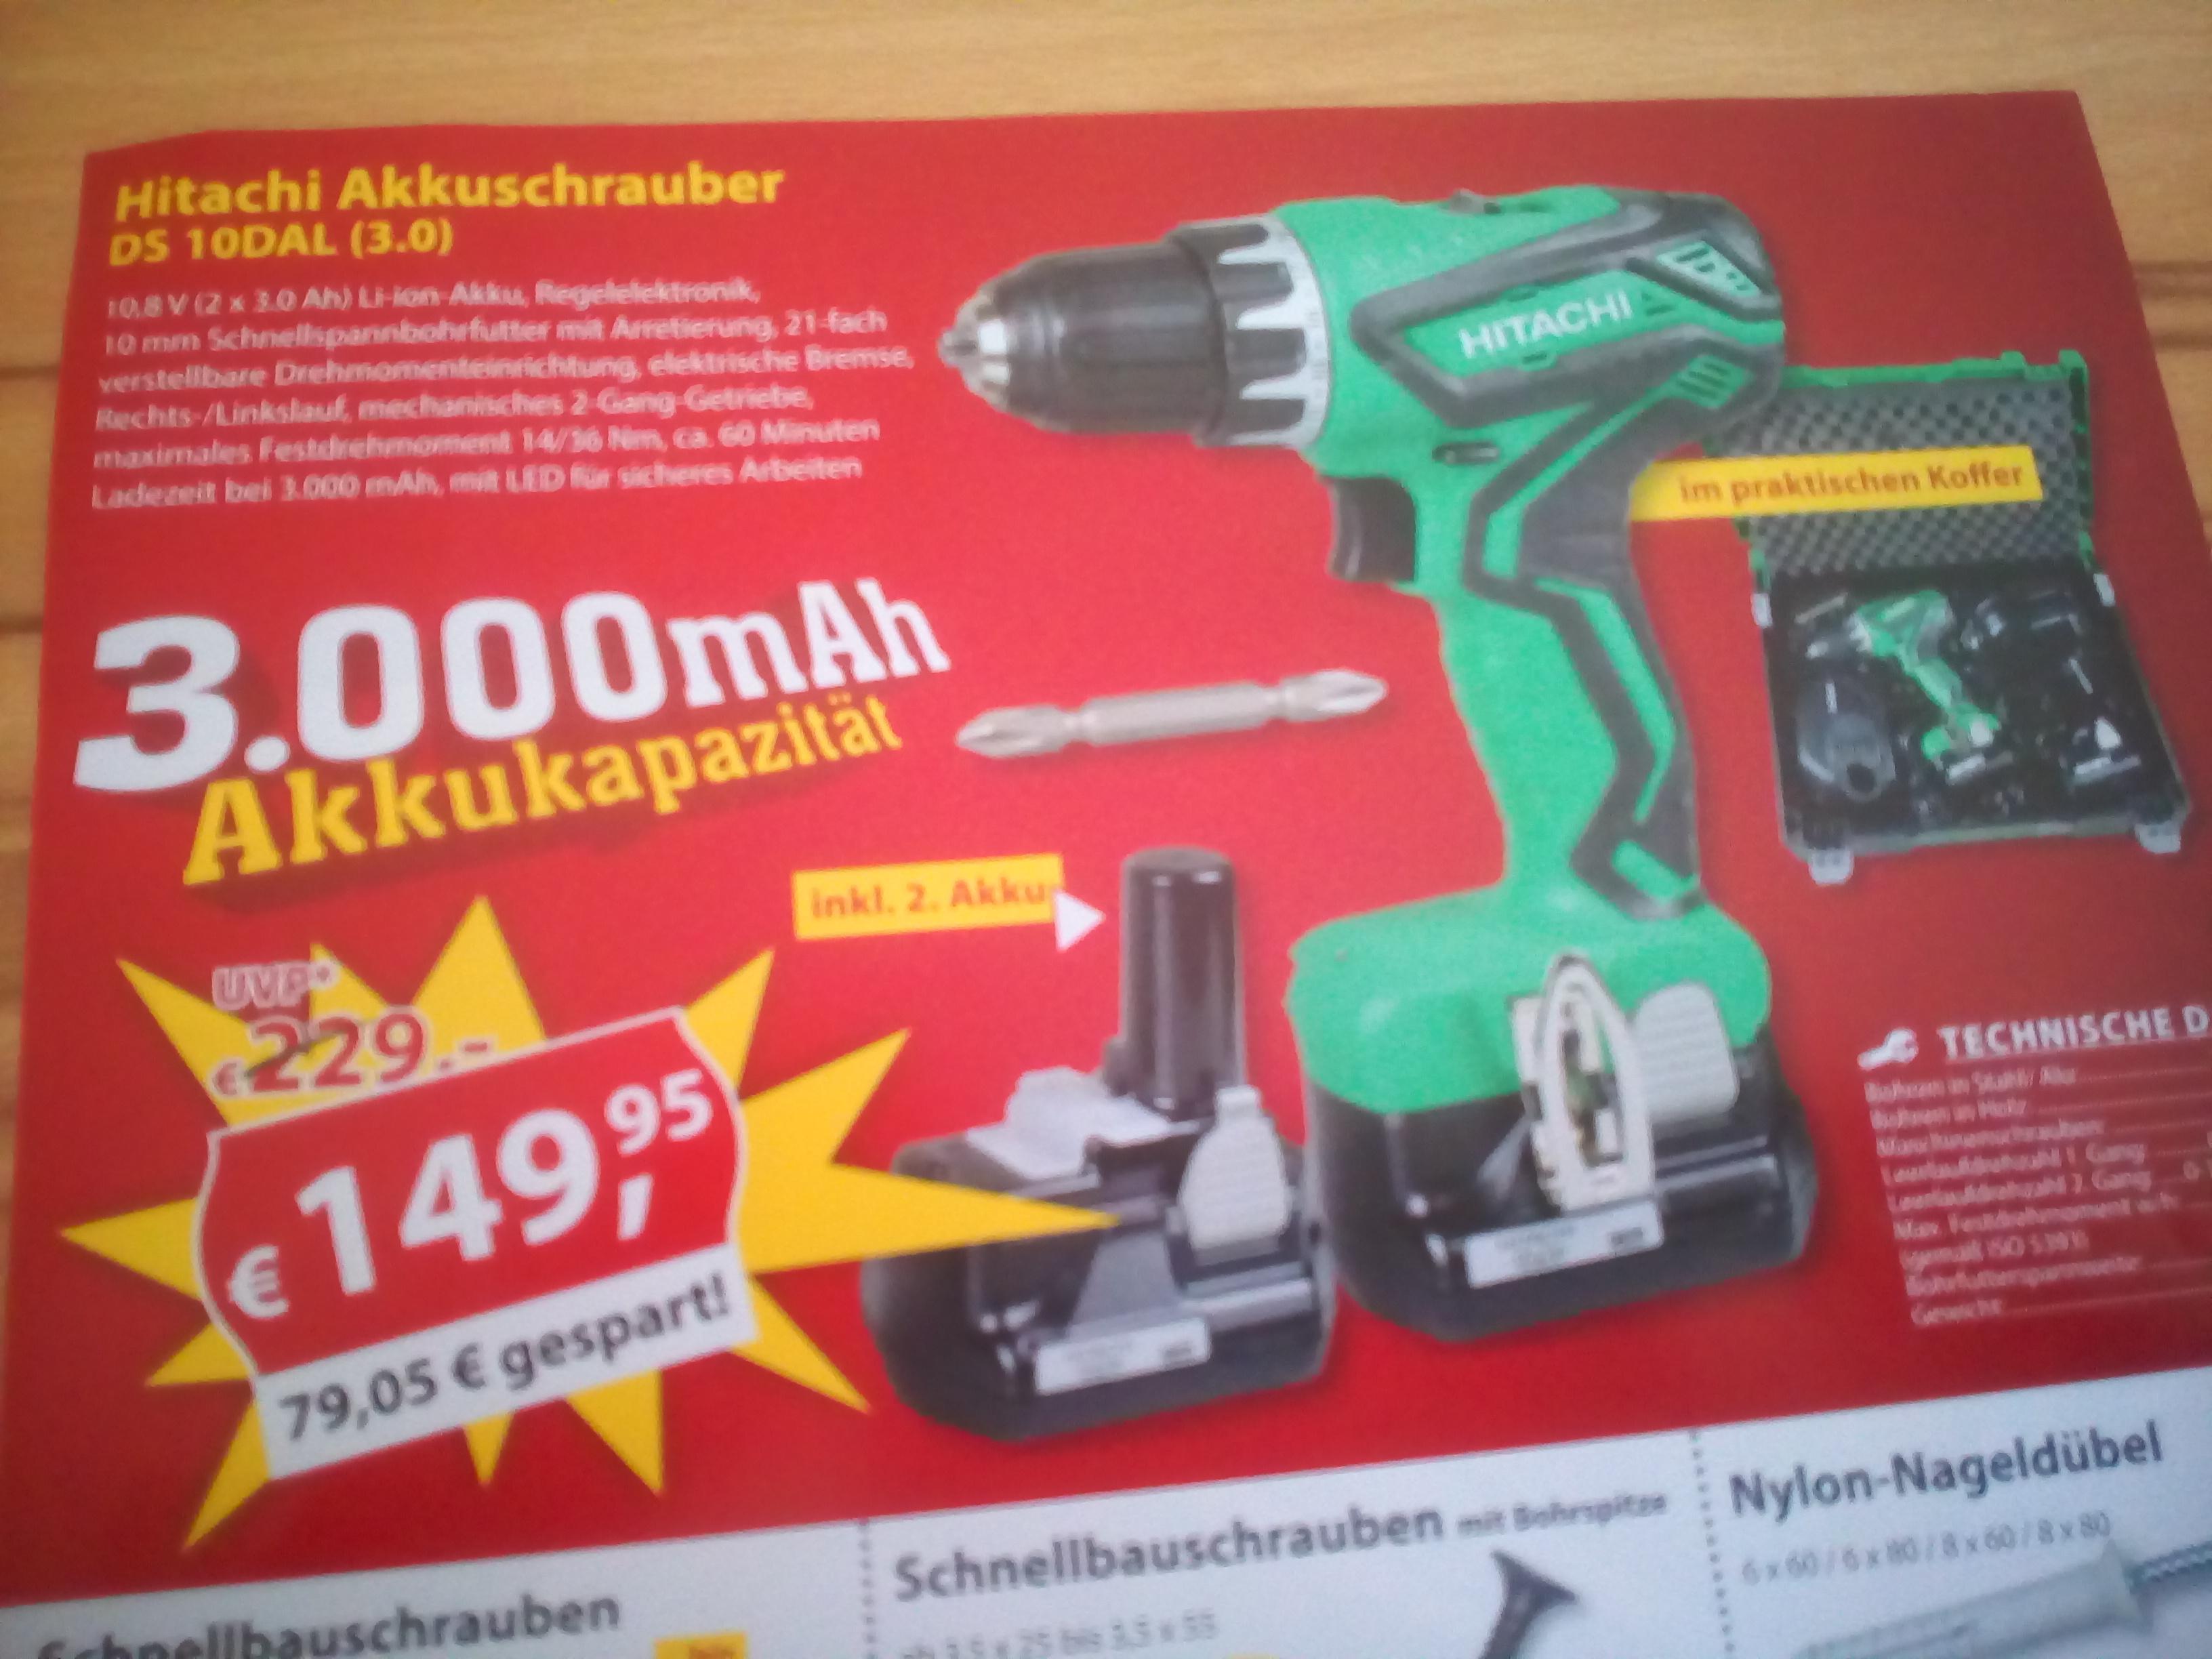 Hitachi DS10DAL (3.0L) 10,8 V Akku Bohrschrauber bei Sonderpreis Baumarkt